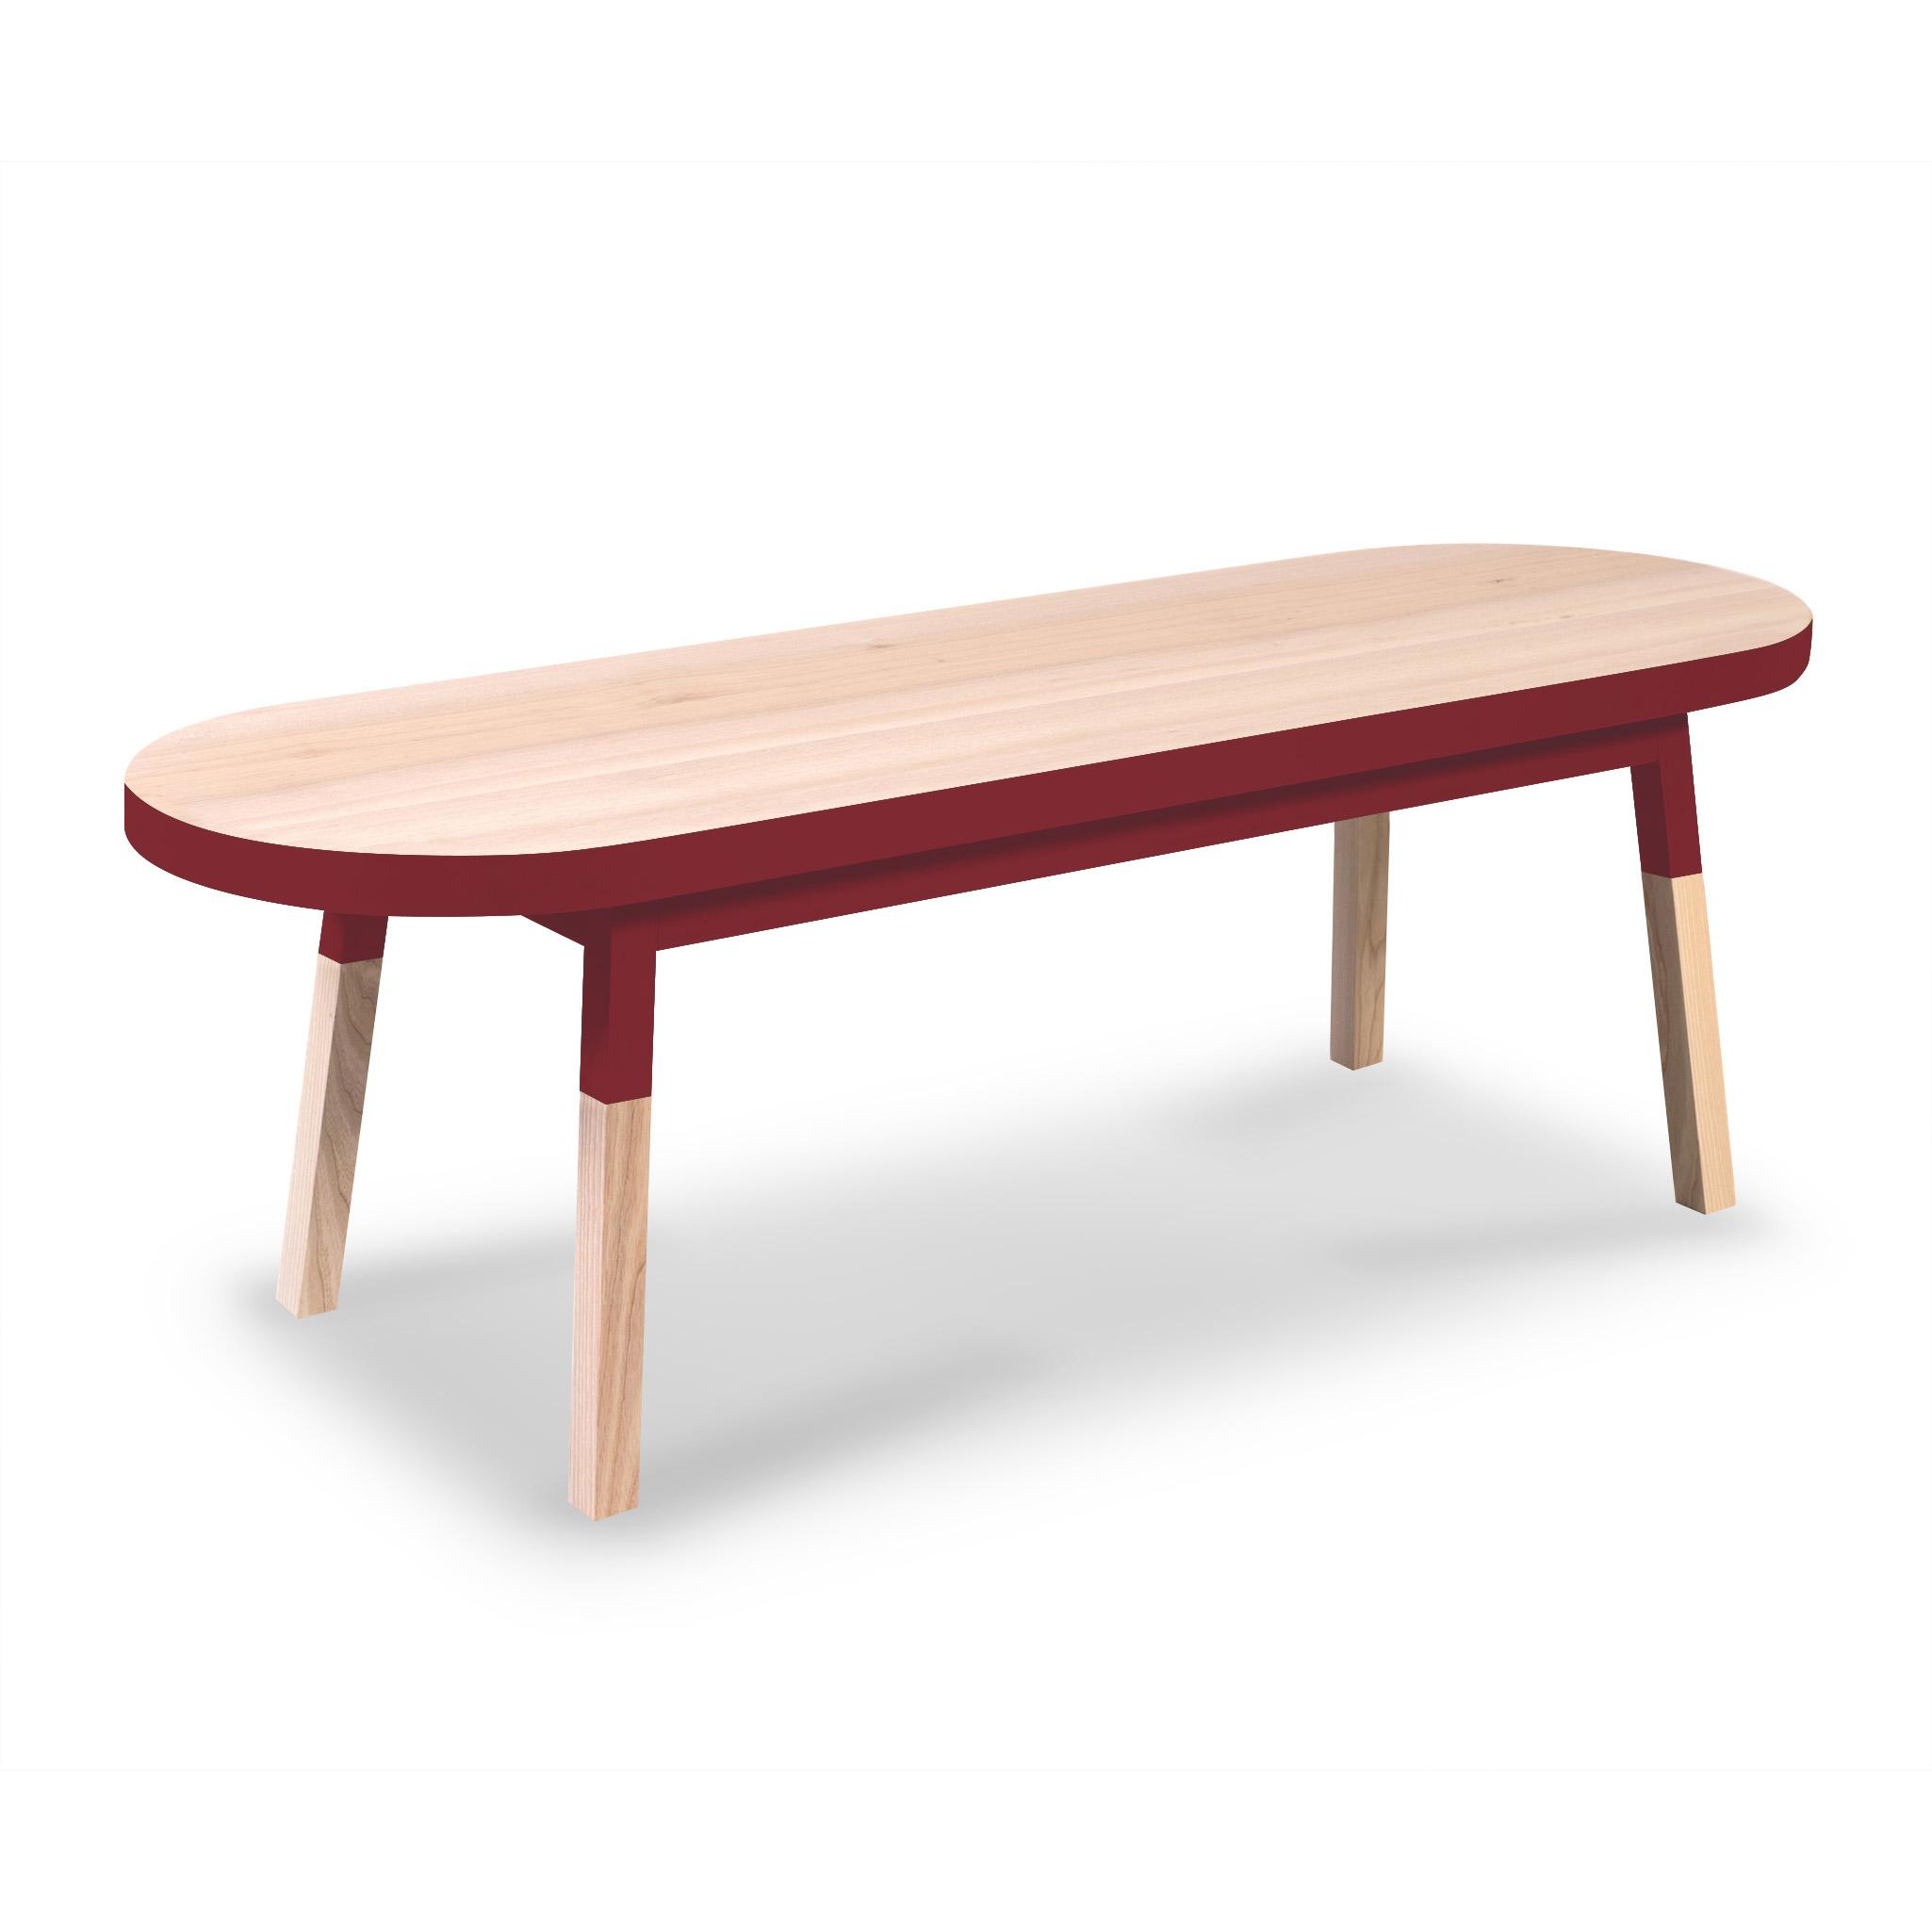 Table basse banc, 100% frêne massif rouge de pluduno